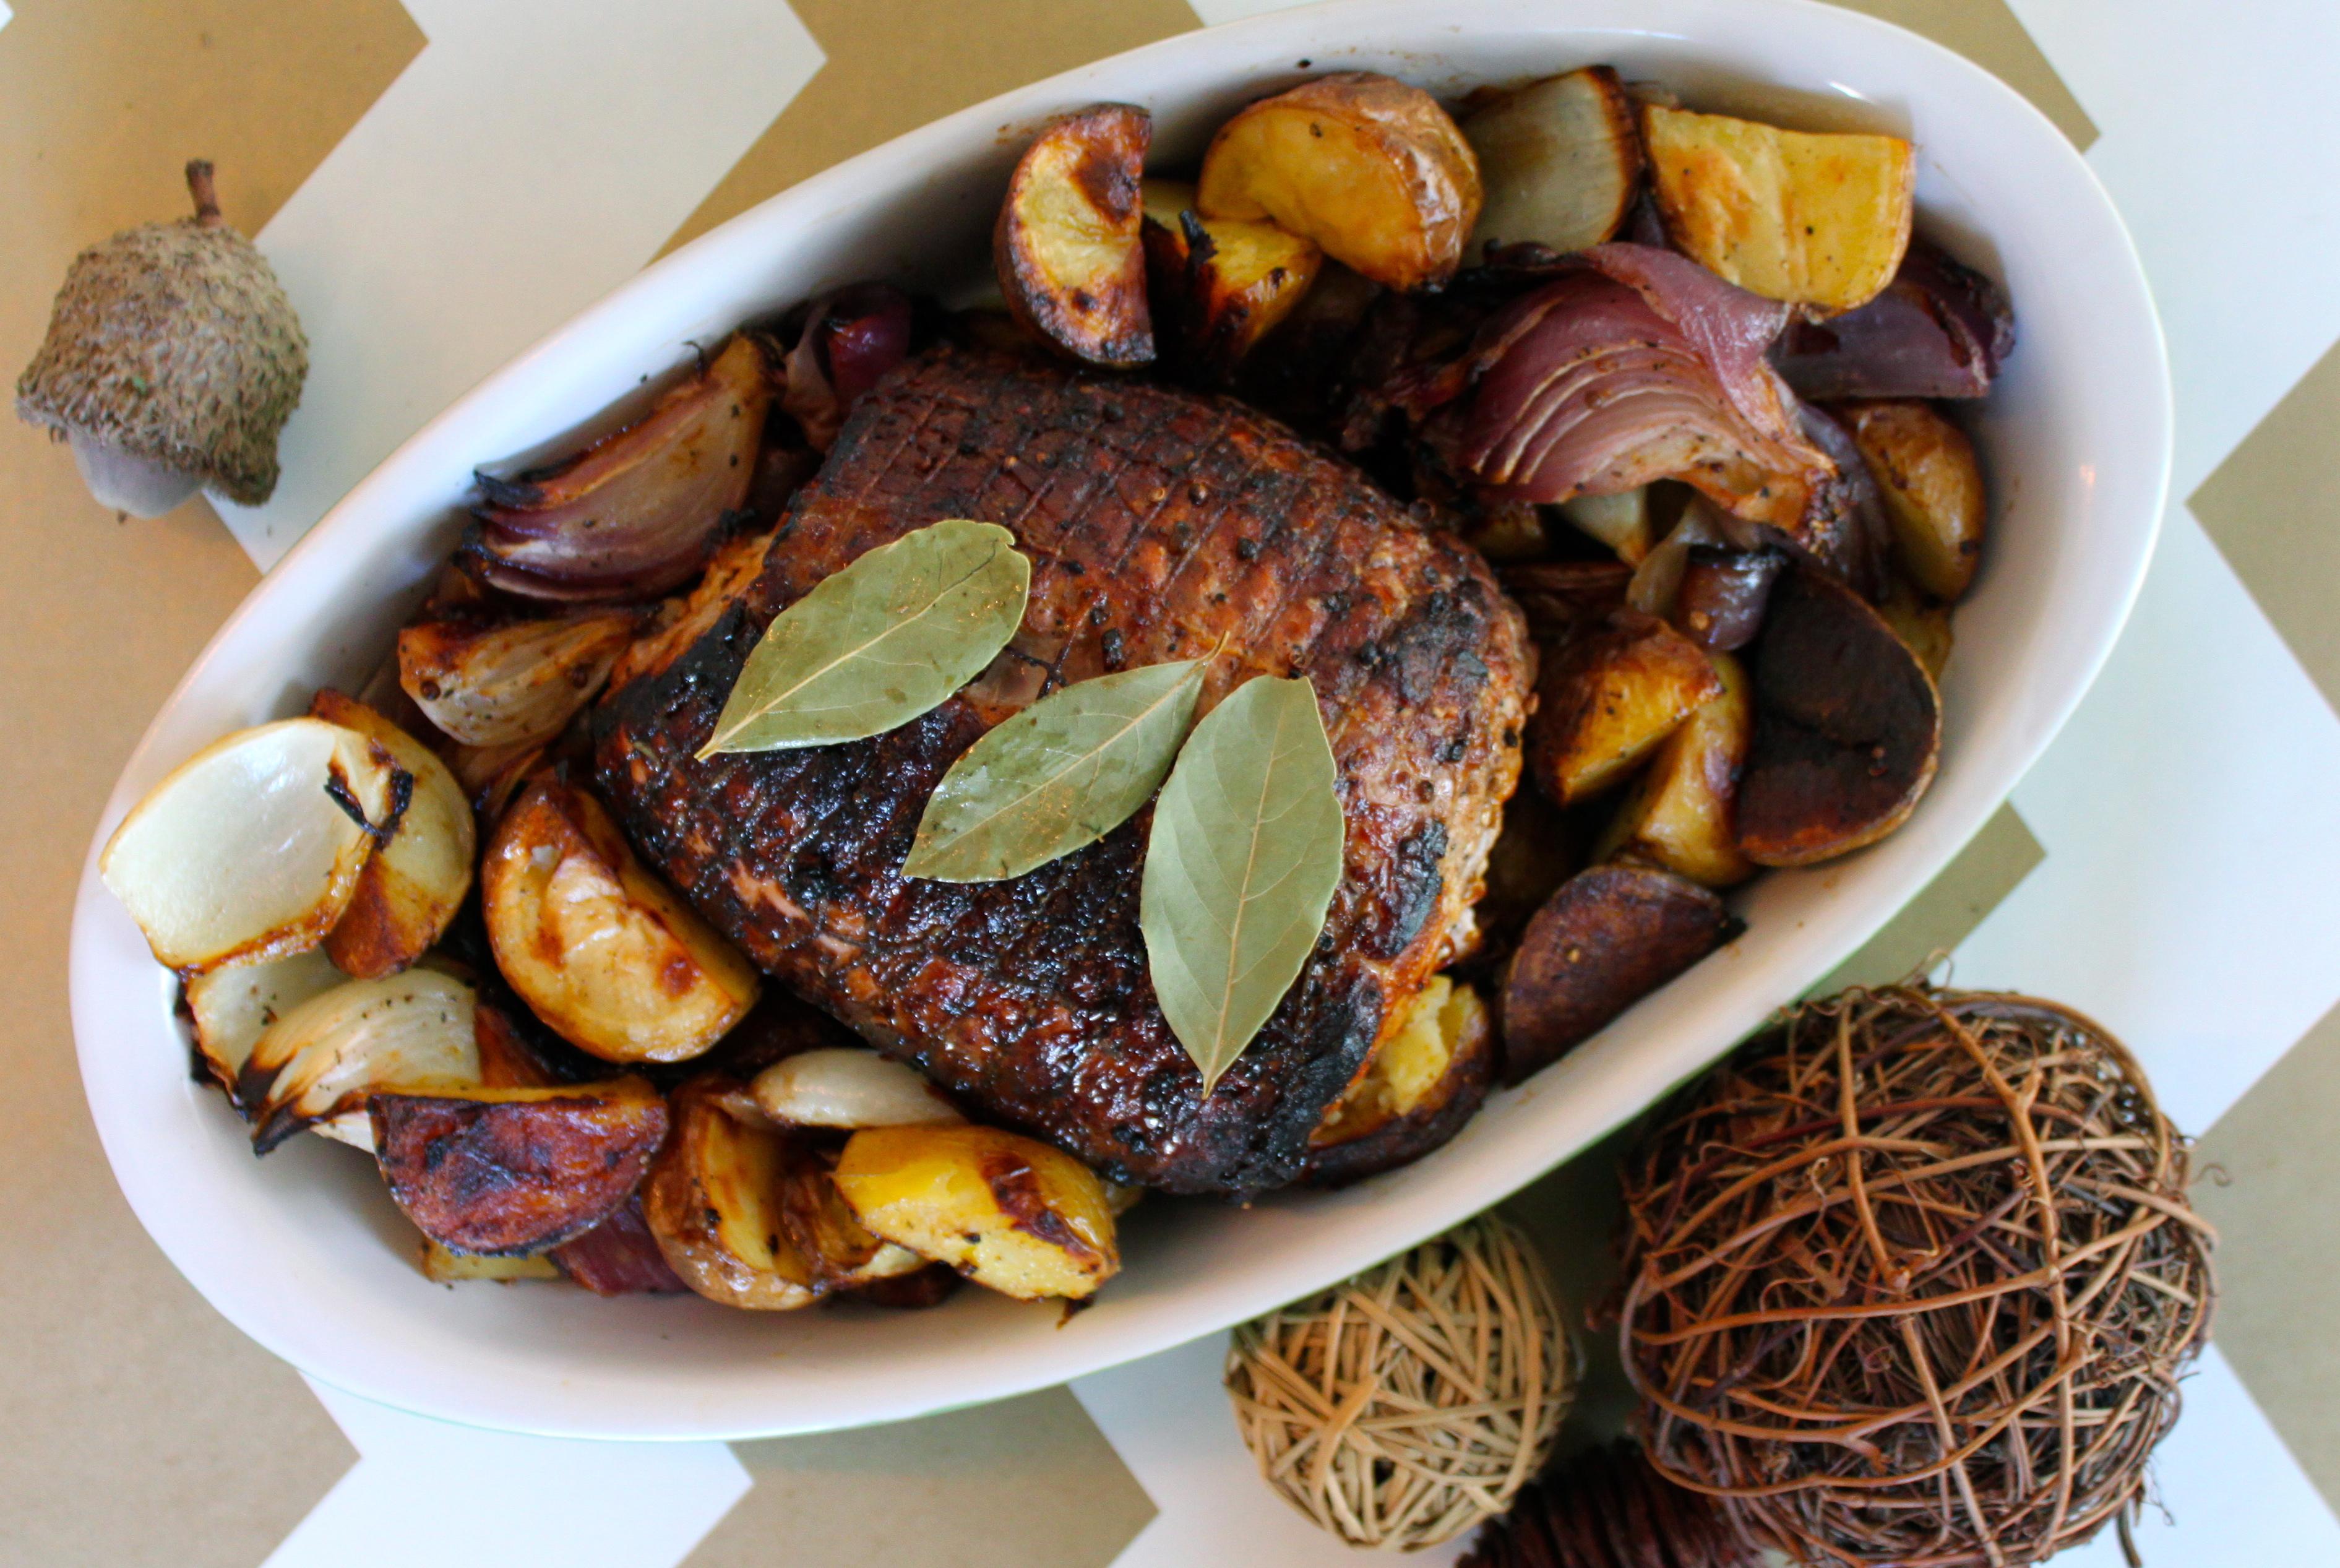 Cider brined pork roast recipe